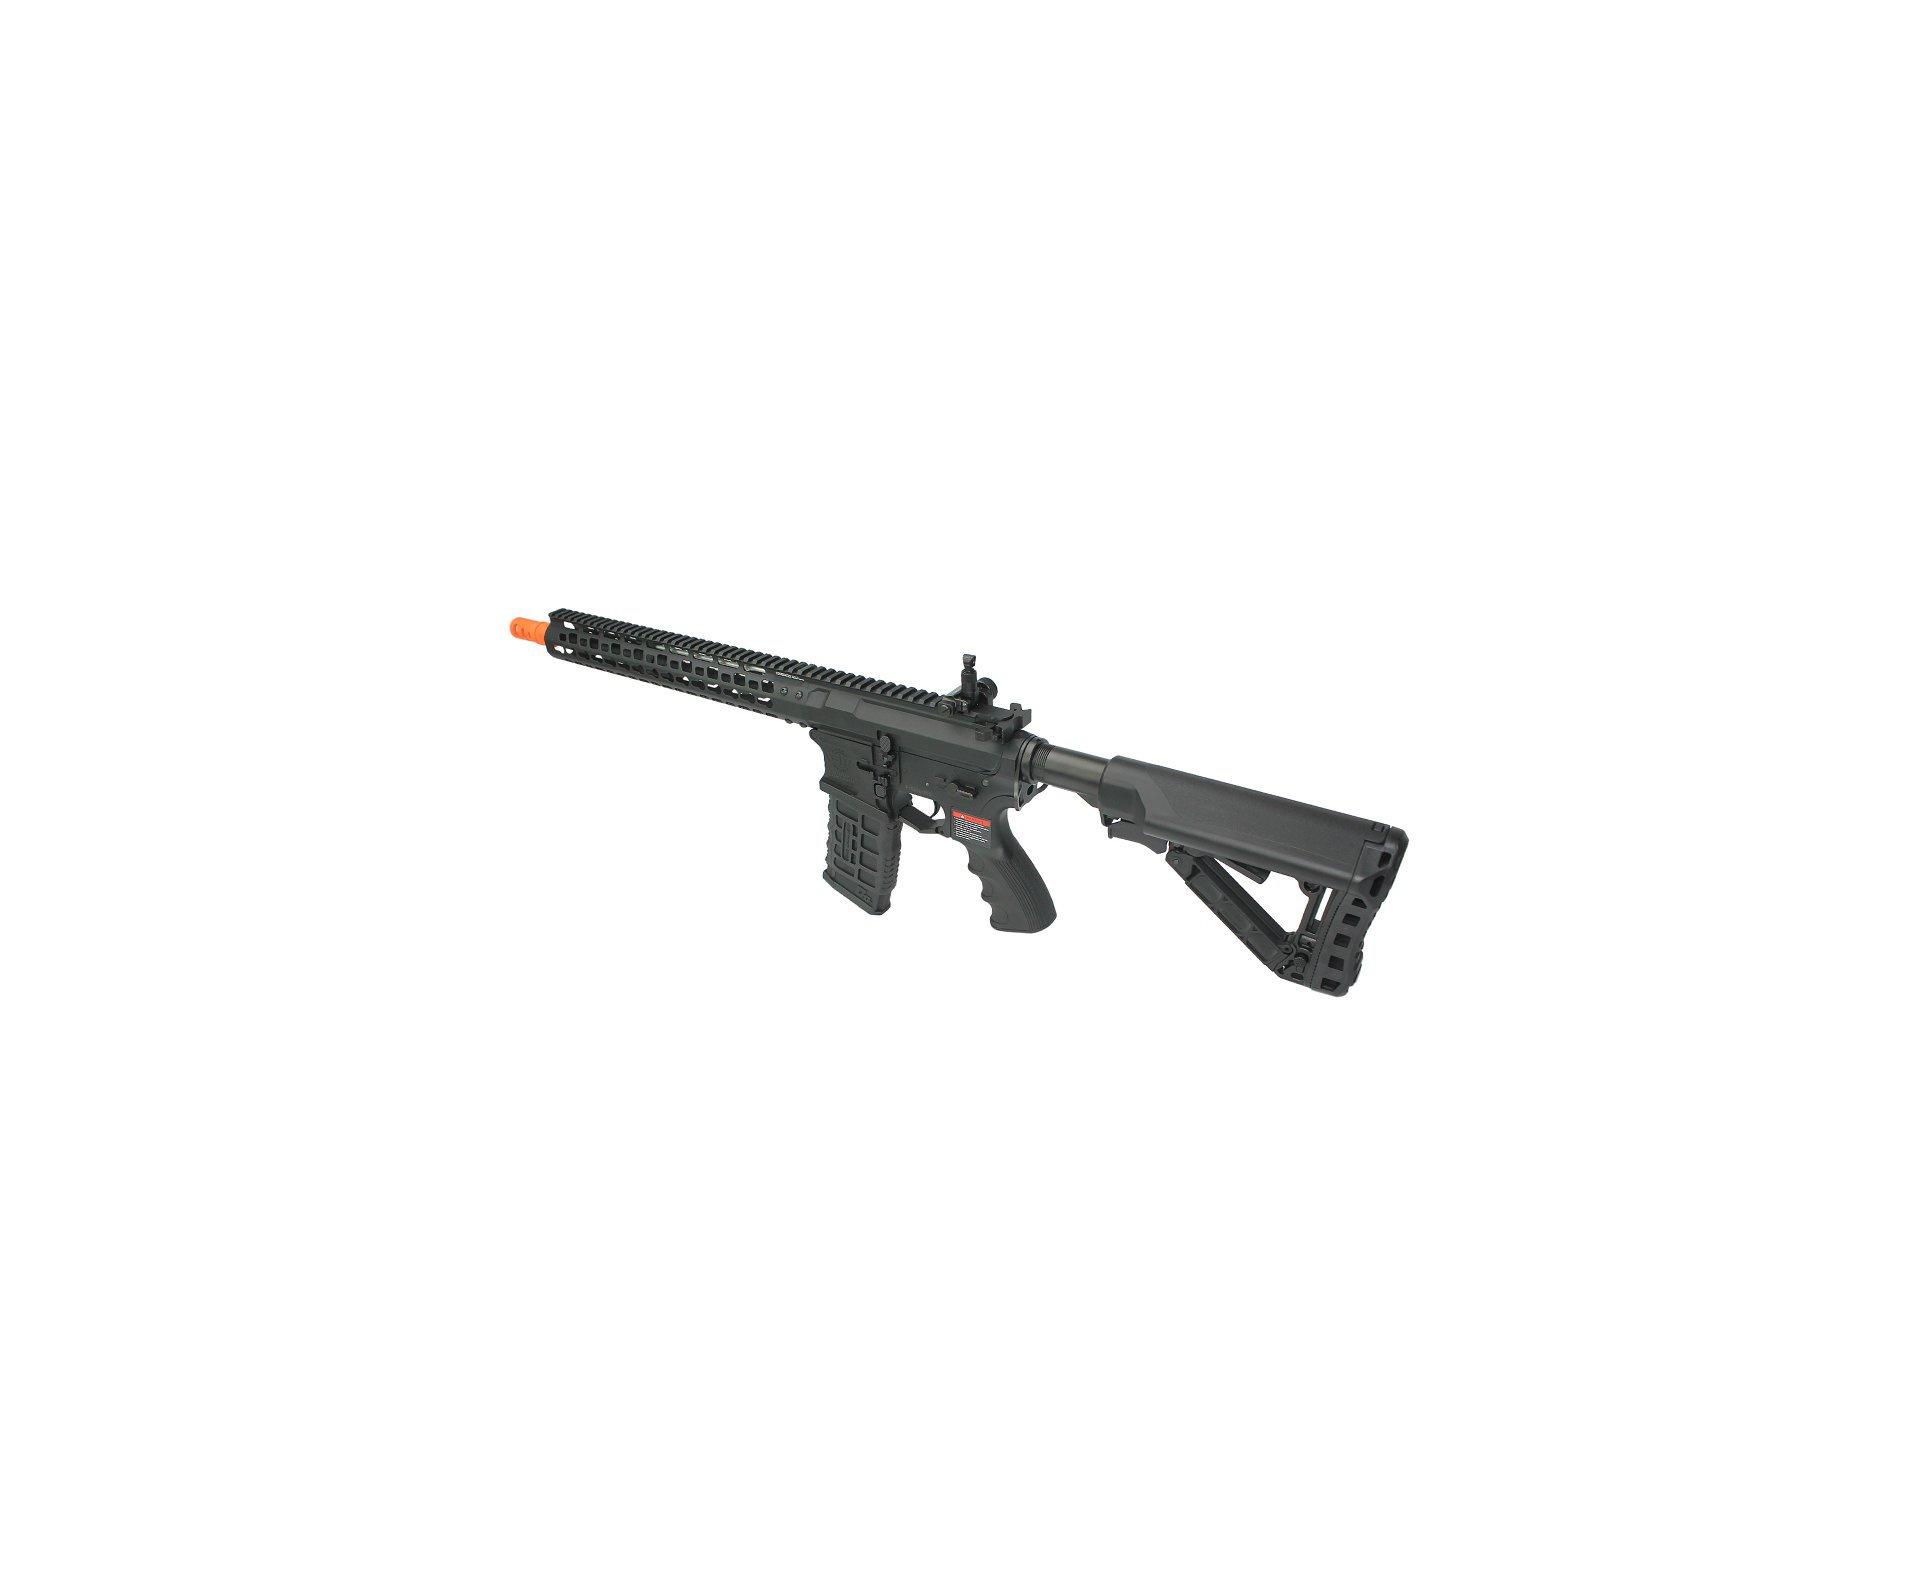 "Rifle De Airsoft Cm16 Wild Hog 13,5"" Long - Elet Mosfet - Cal 6mm - G&g"